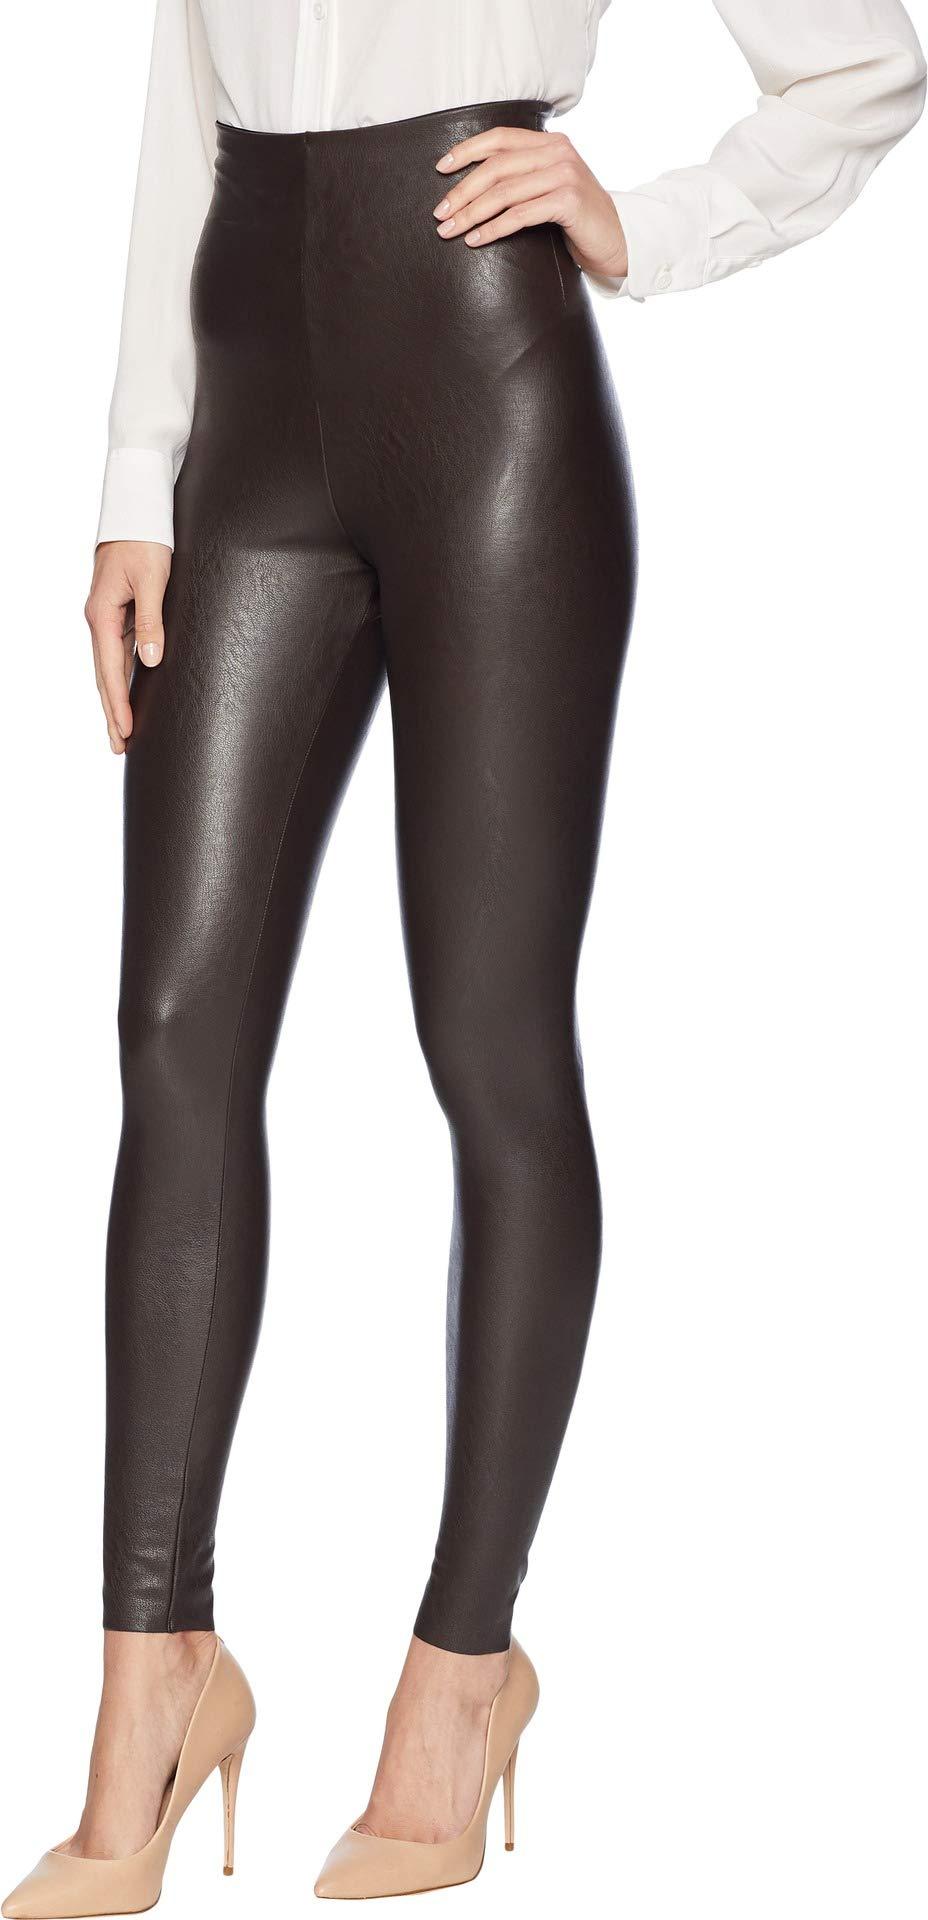 commando Women's Perfect Control Faux Leather Leggings SLG06 Espresso Large by commando (Image #2)